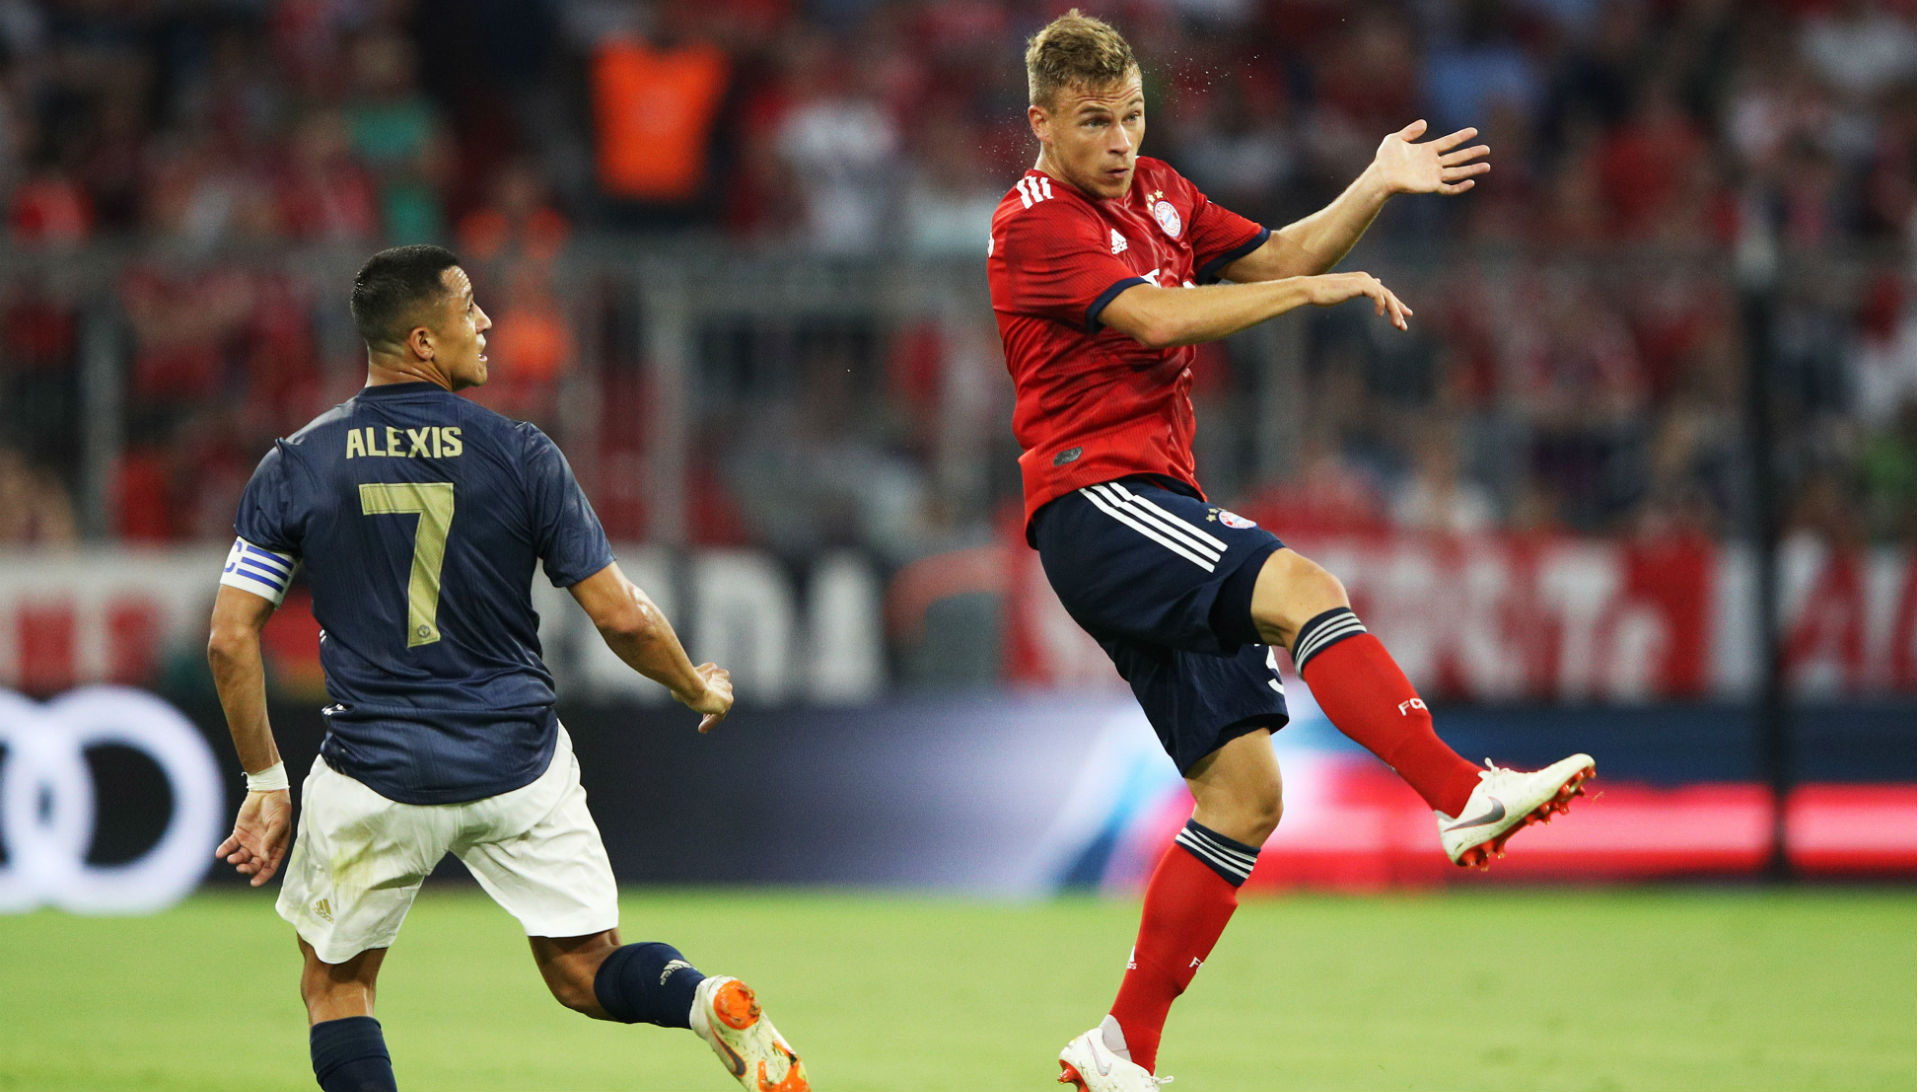 050818 Alexis Sánchez Joshua Kimmich Manchester United Bayern Münich